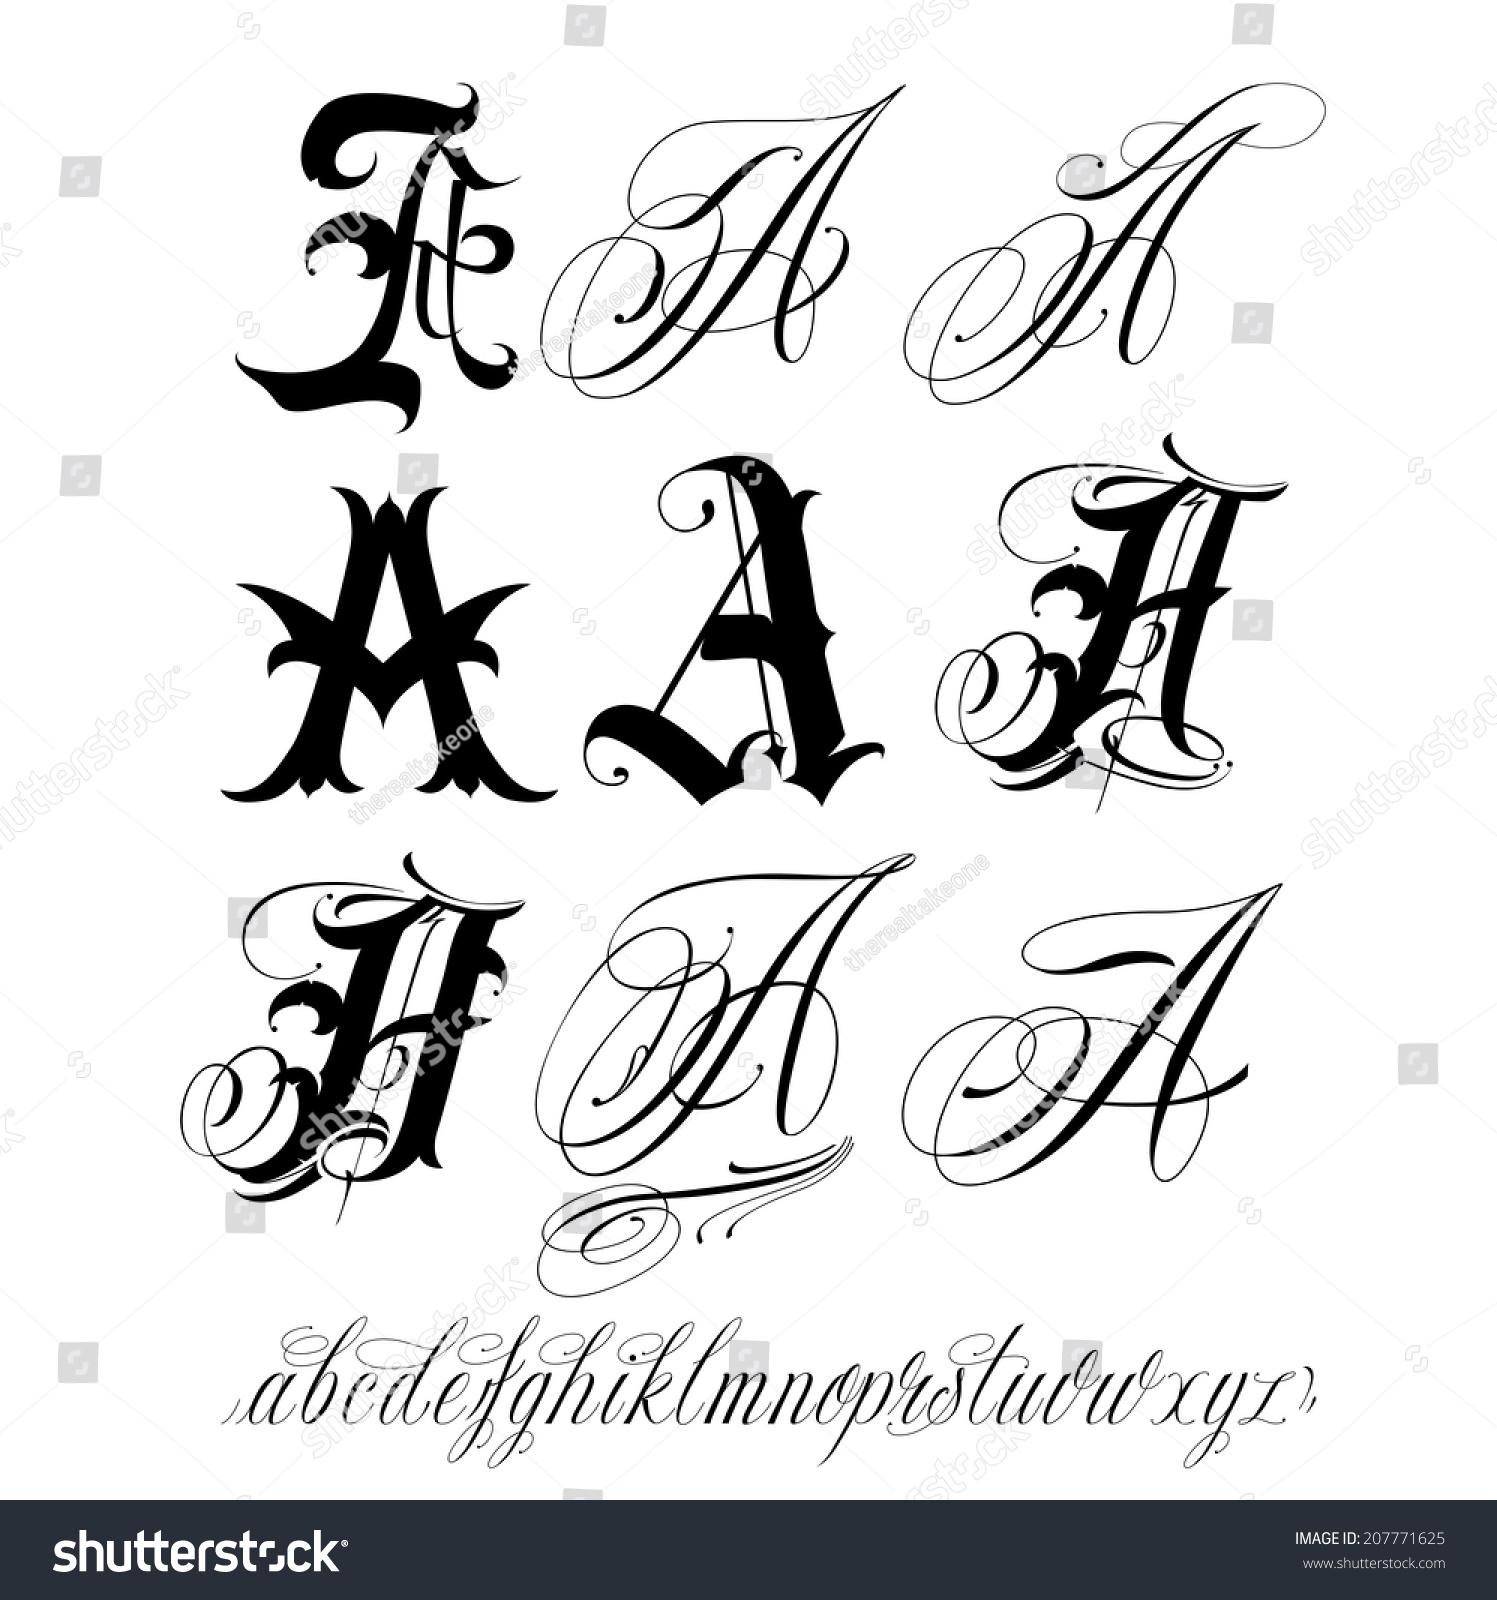 Handmade vector calligraphy tattoo alphabet stock